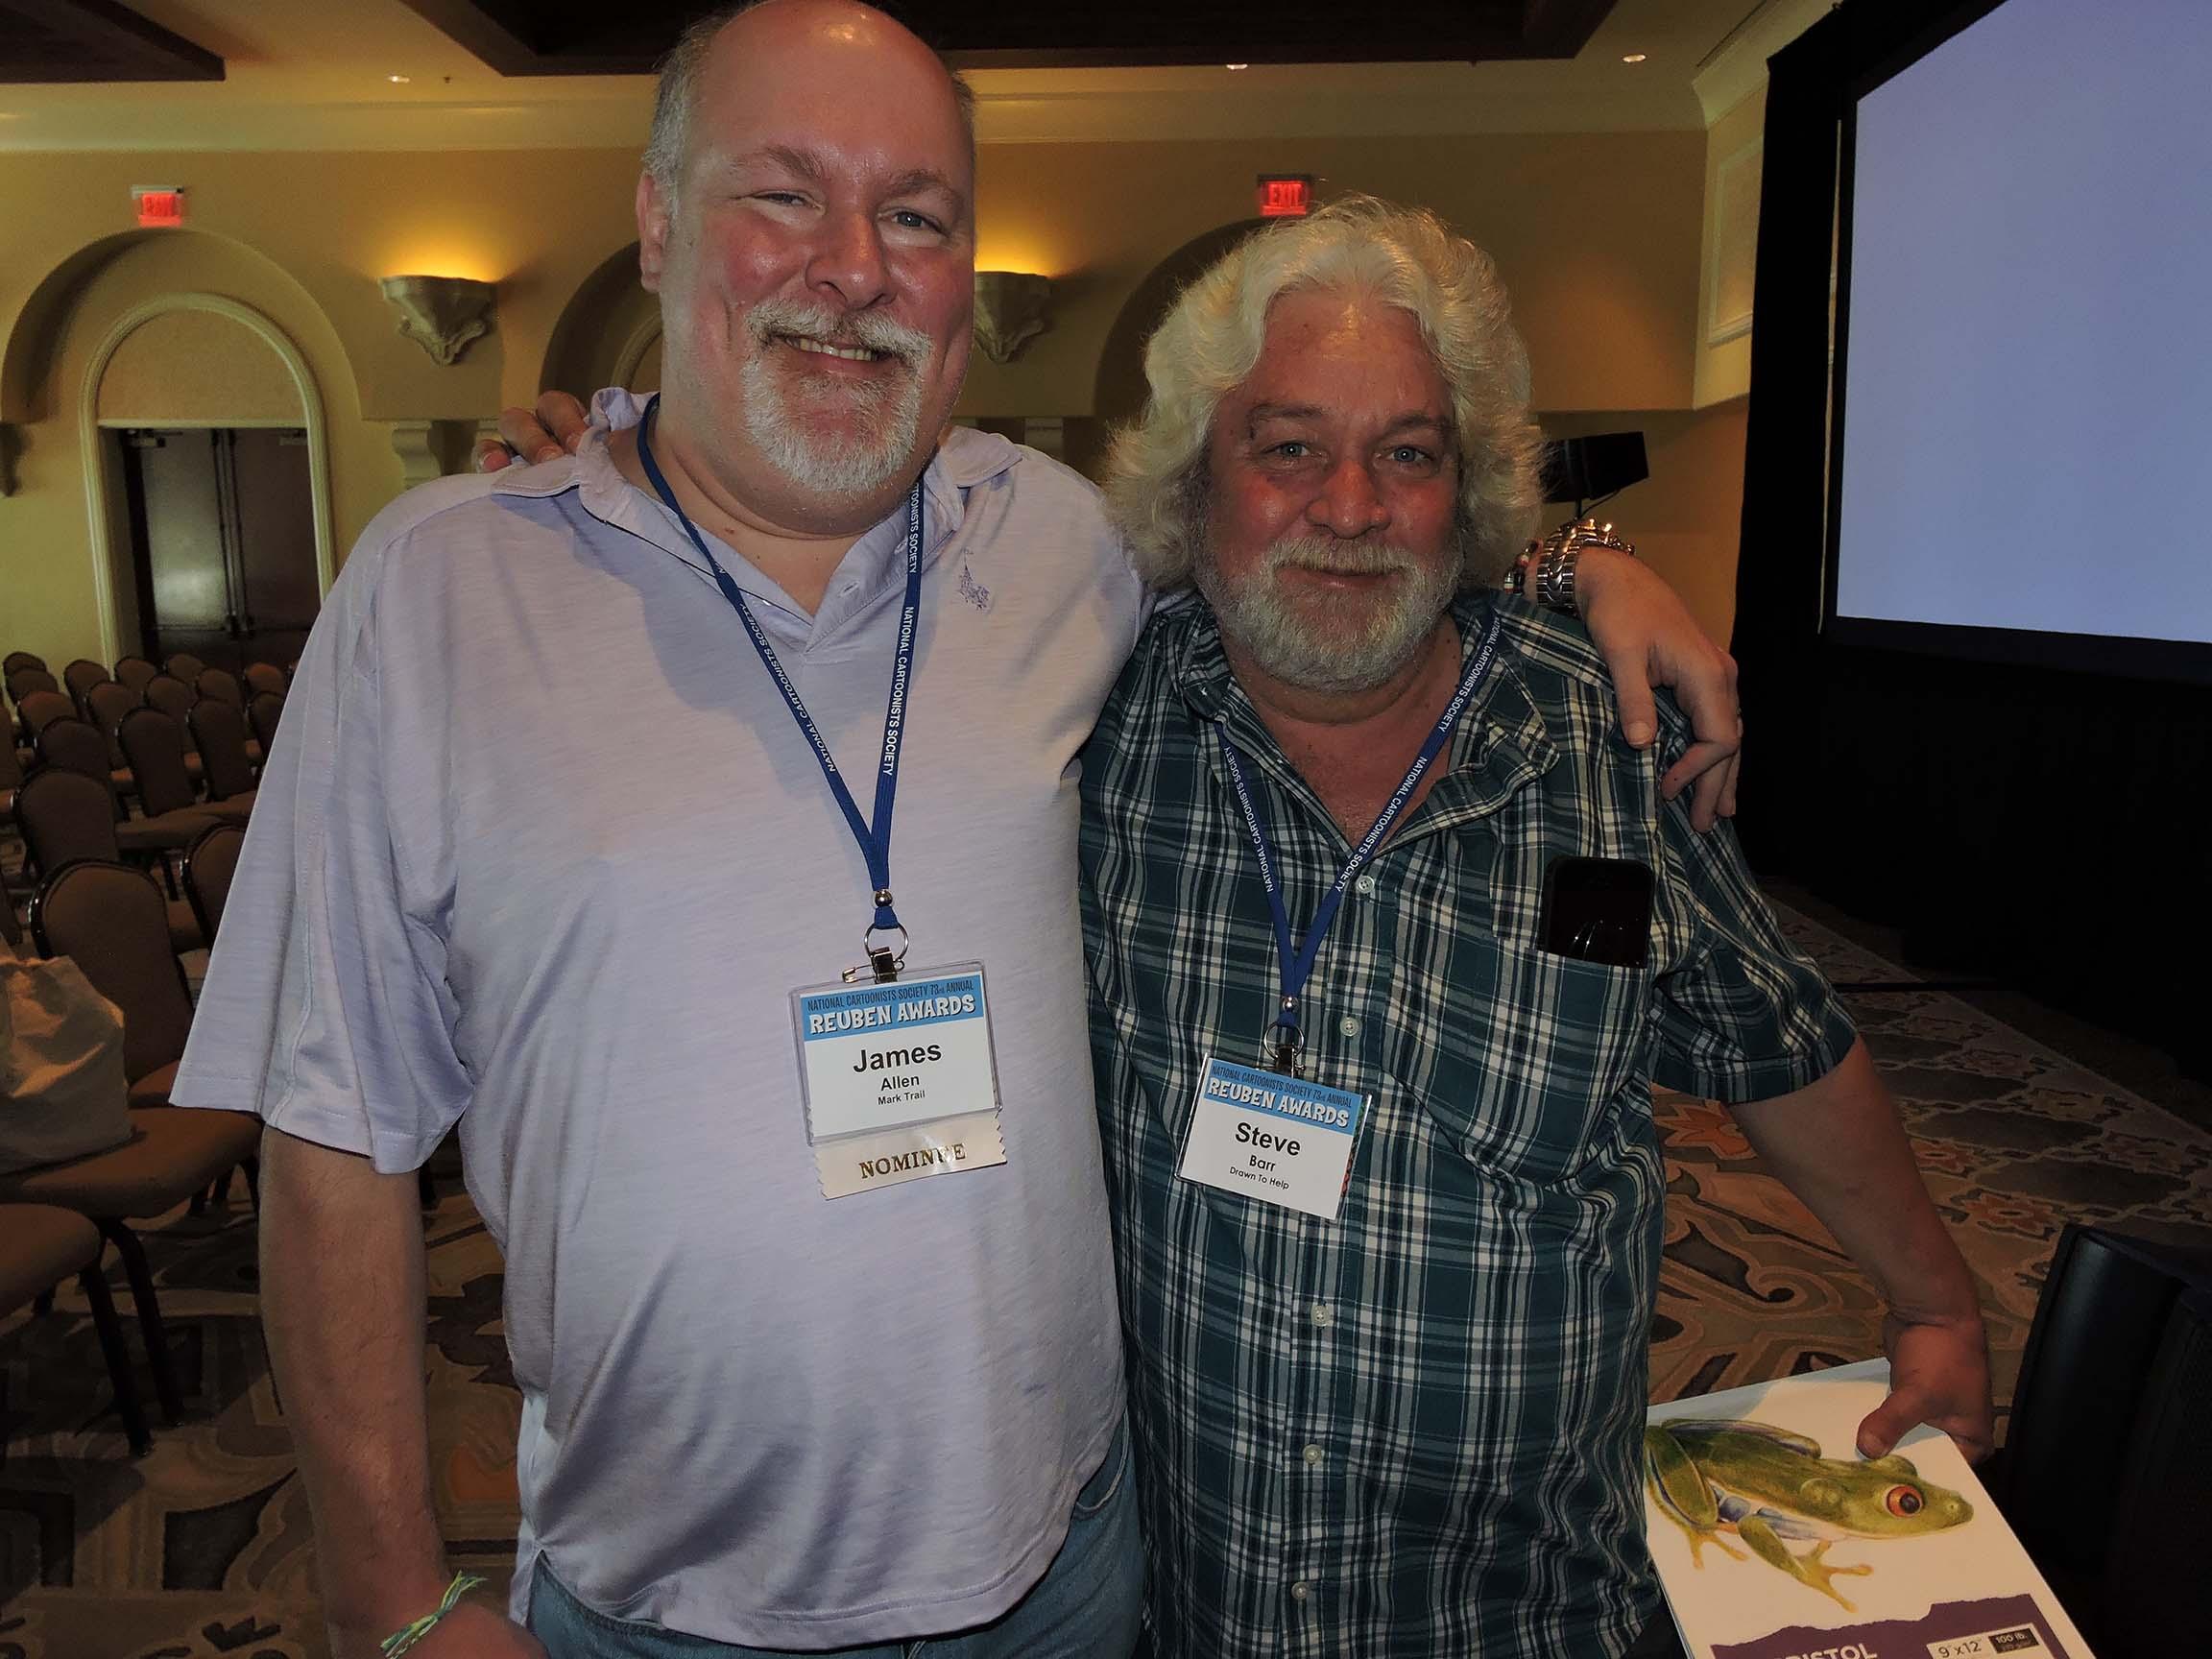 James Allen (left) and Steve Barr